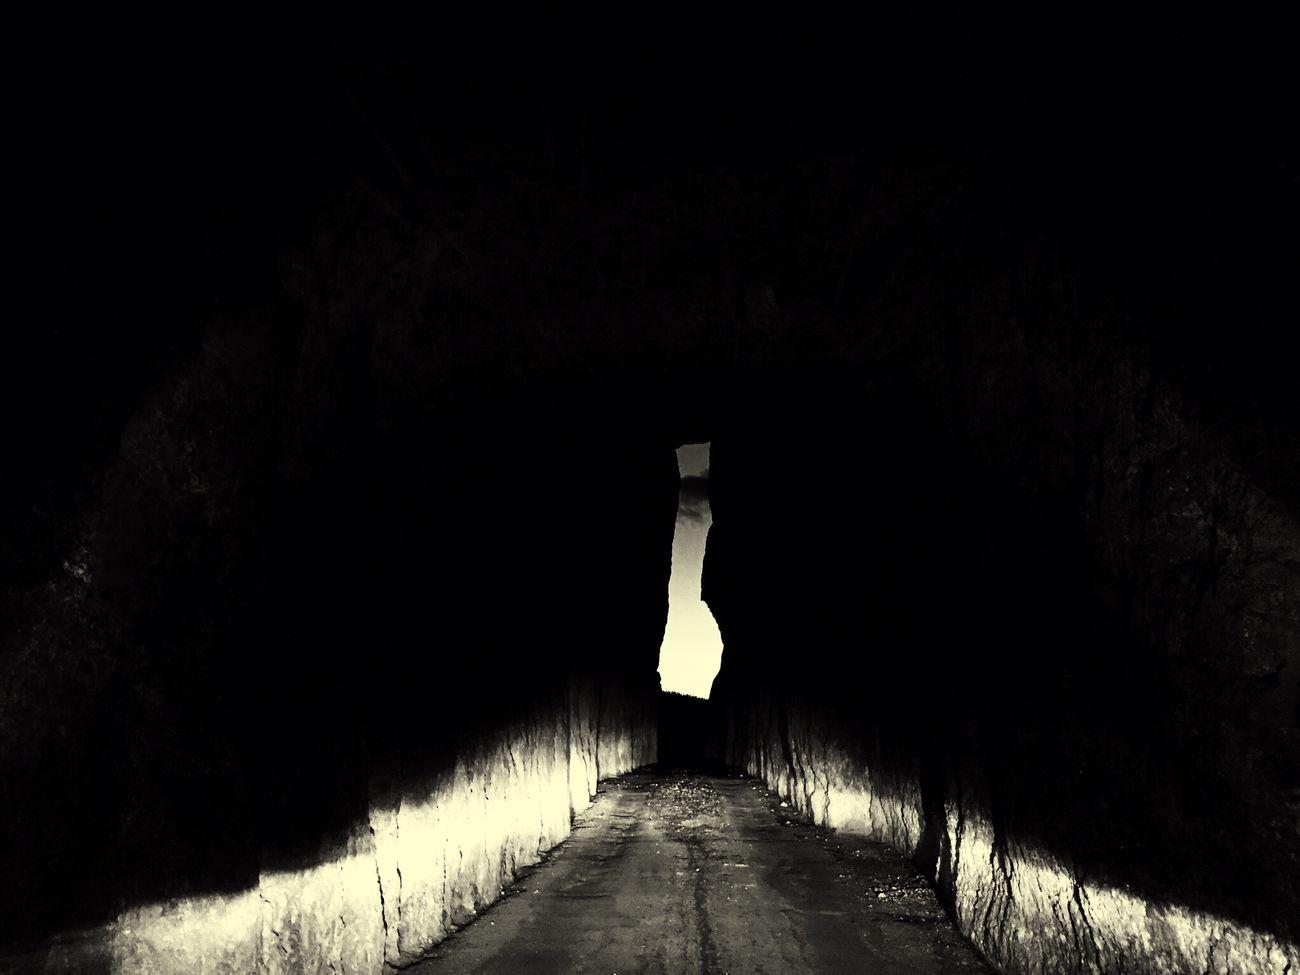 Gateway Nightmountain Narrow Dark Diminishing Perspective Tranquility No People